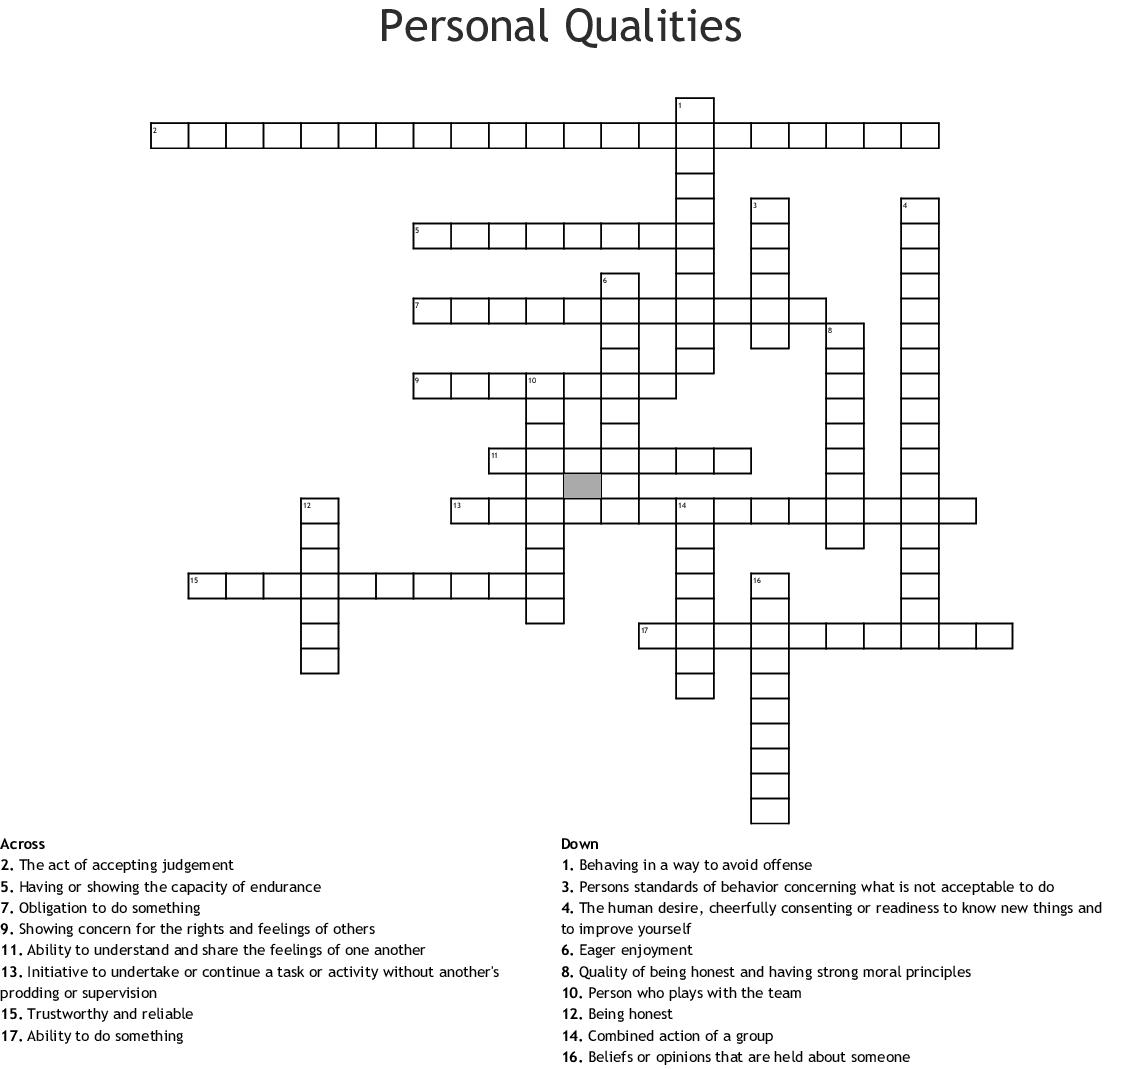 Plumlike Asian Fruit Crossword Clue Archives Laxcrossword Com